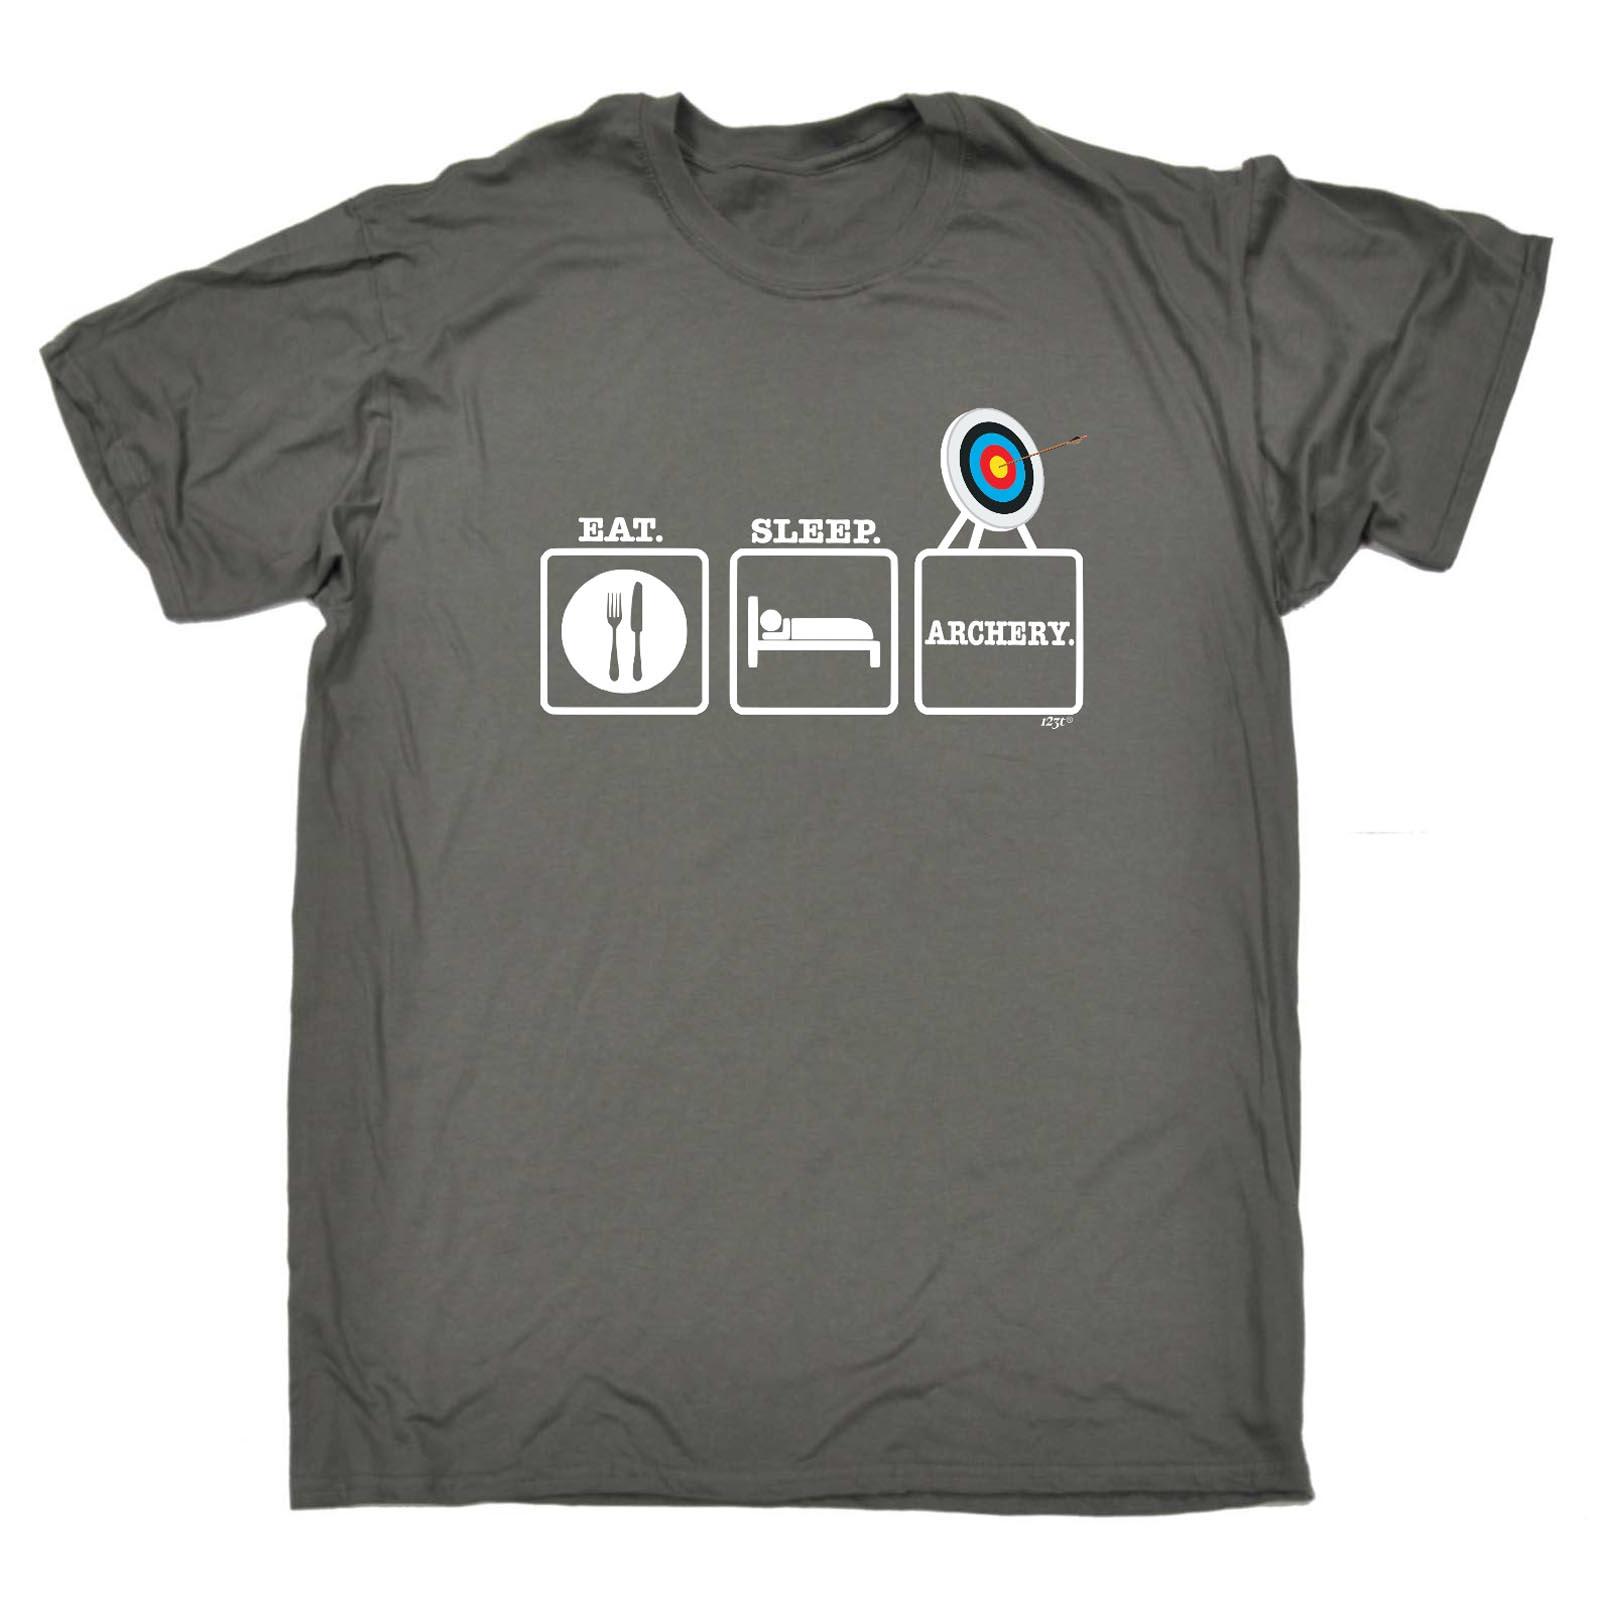 Funny-Novelty-T-Shirt-Mens-tee-TShirt-Eat-Sleep-Archery